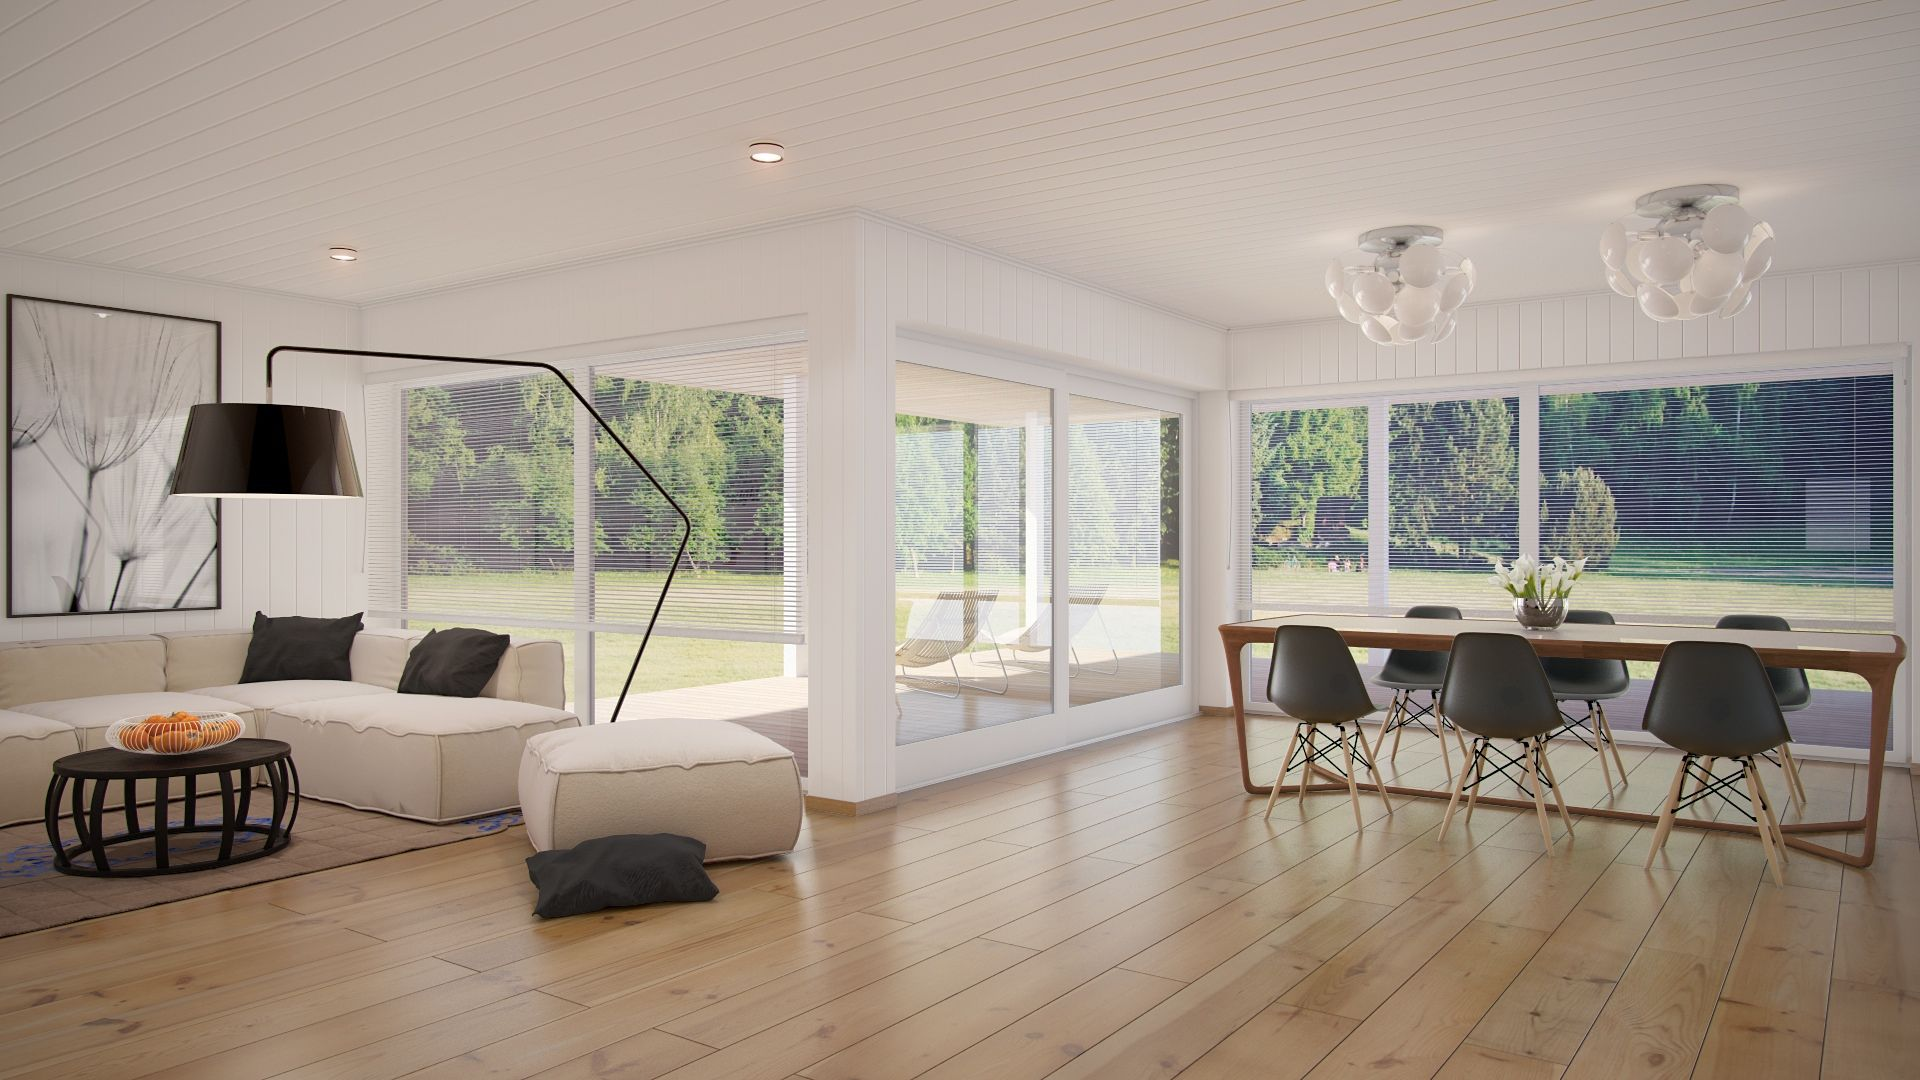 White gray open plan living area | Dwell - Interior ...